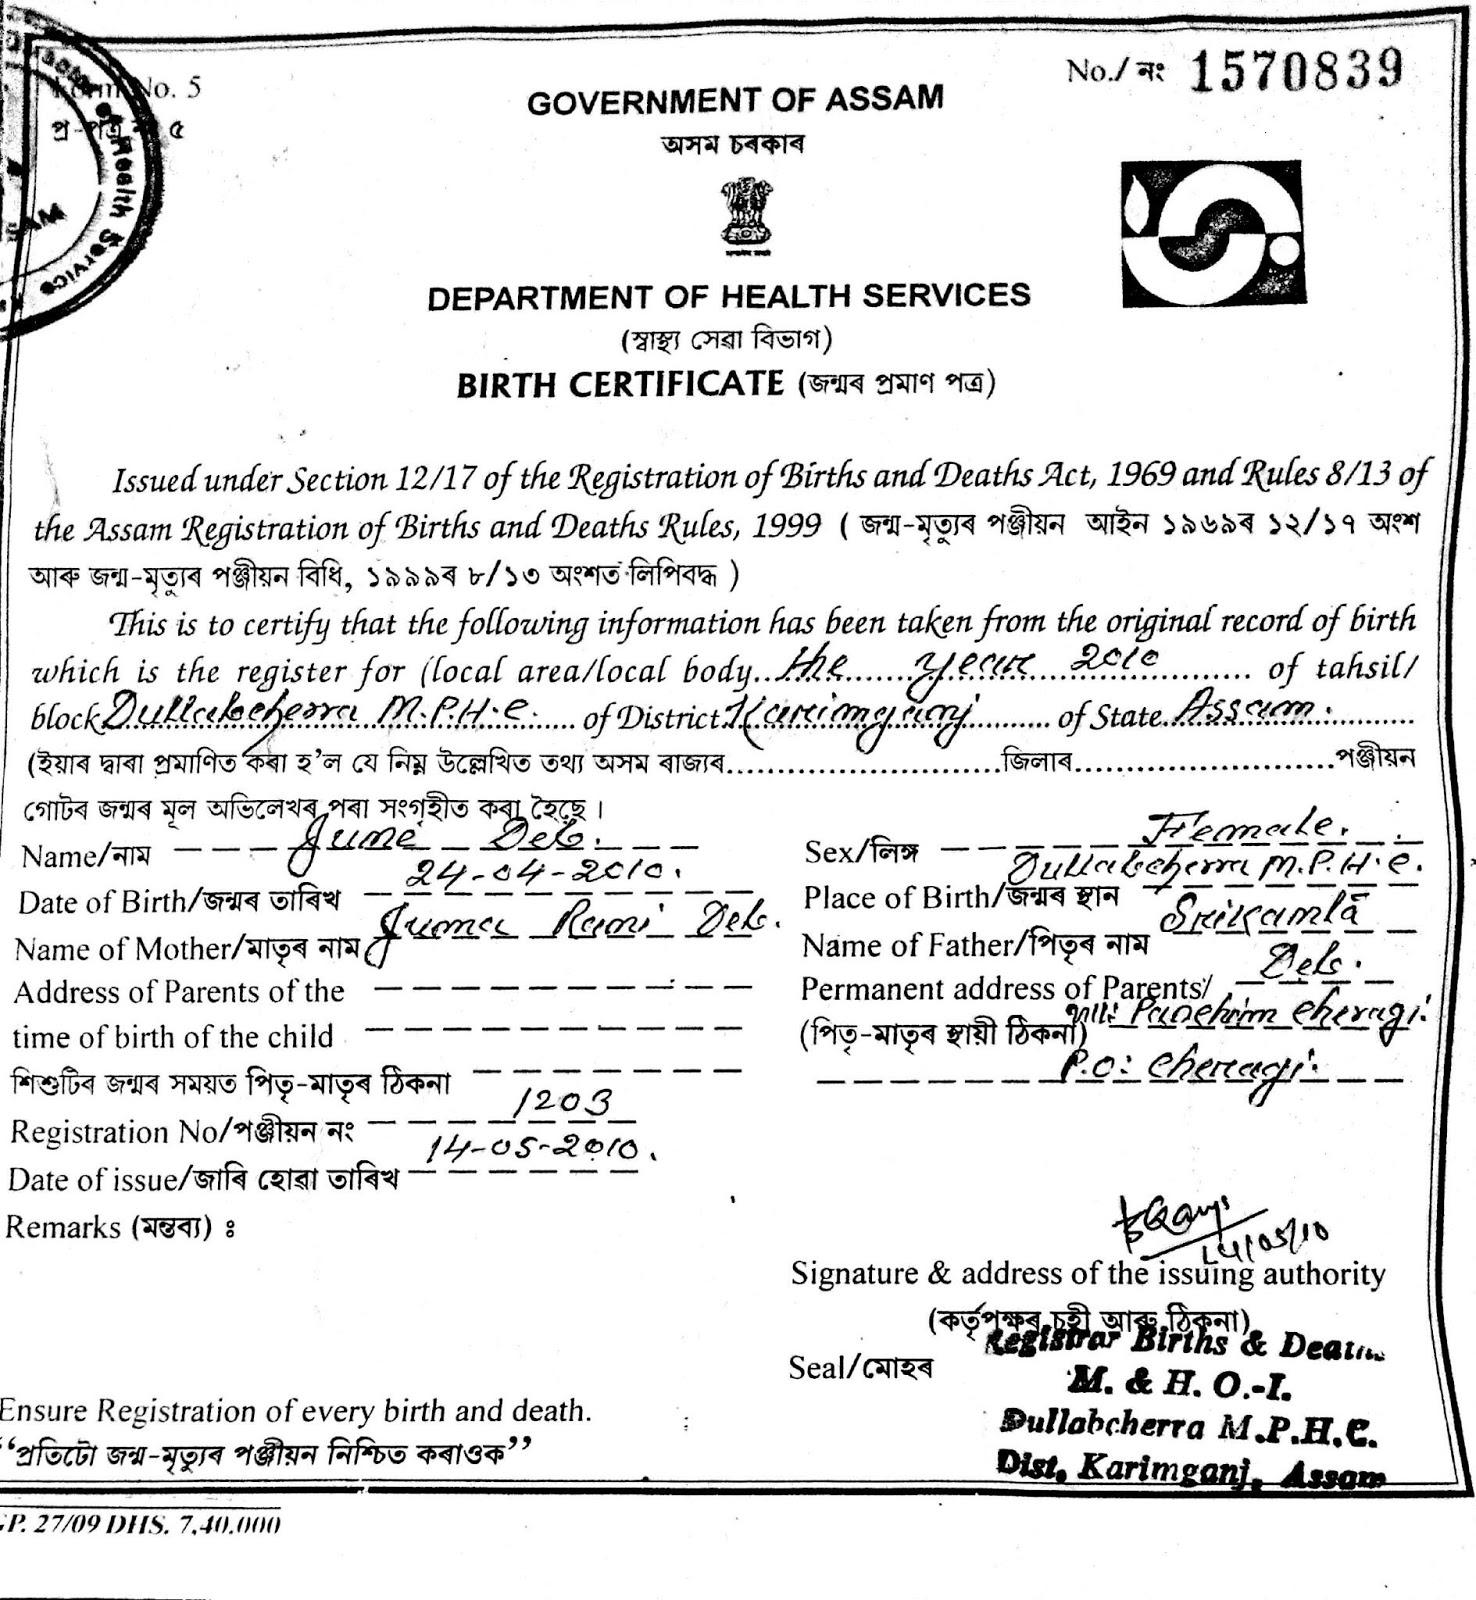 484 no kashinathpur lp school students birth certificate students birth certificate aiddatafo Choice Image